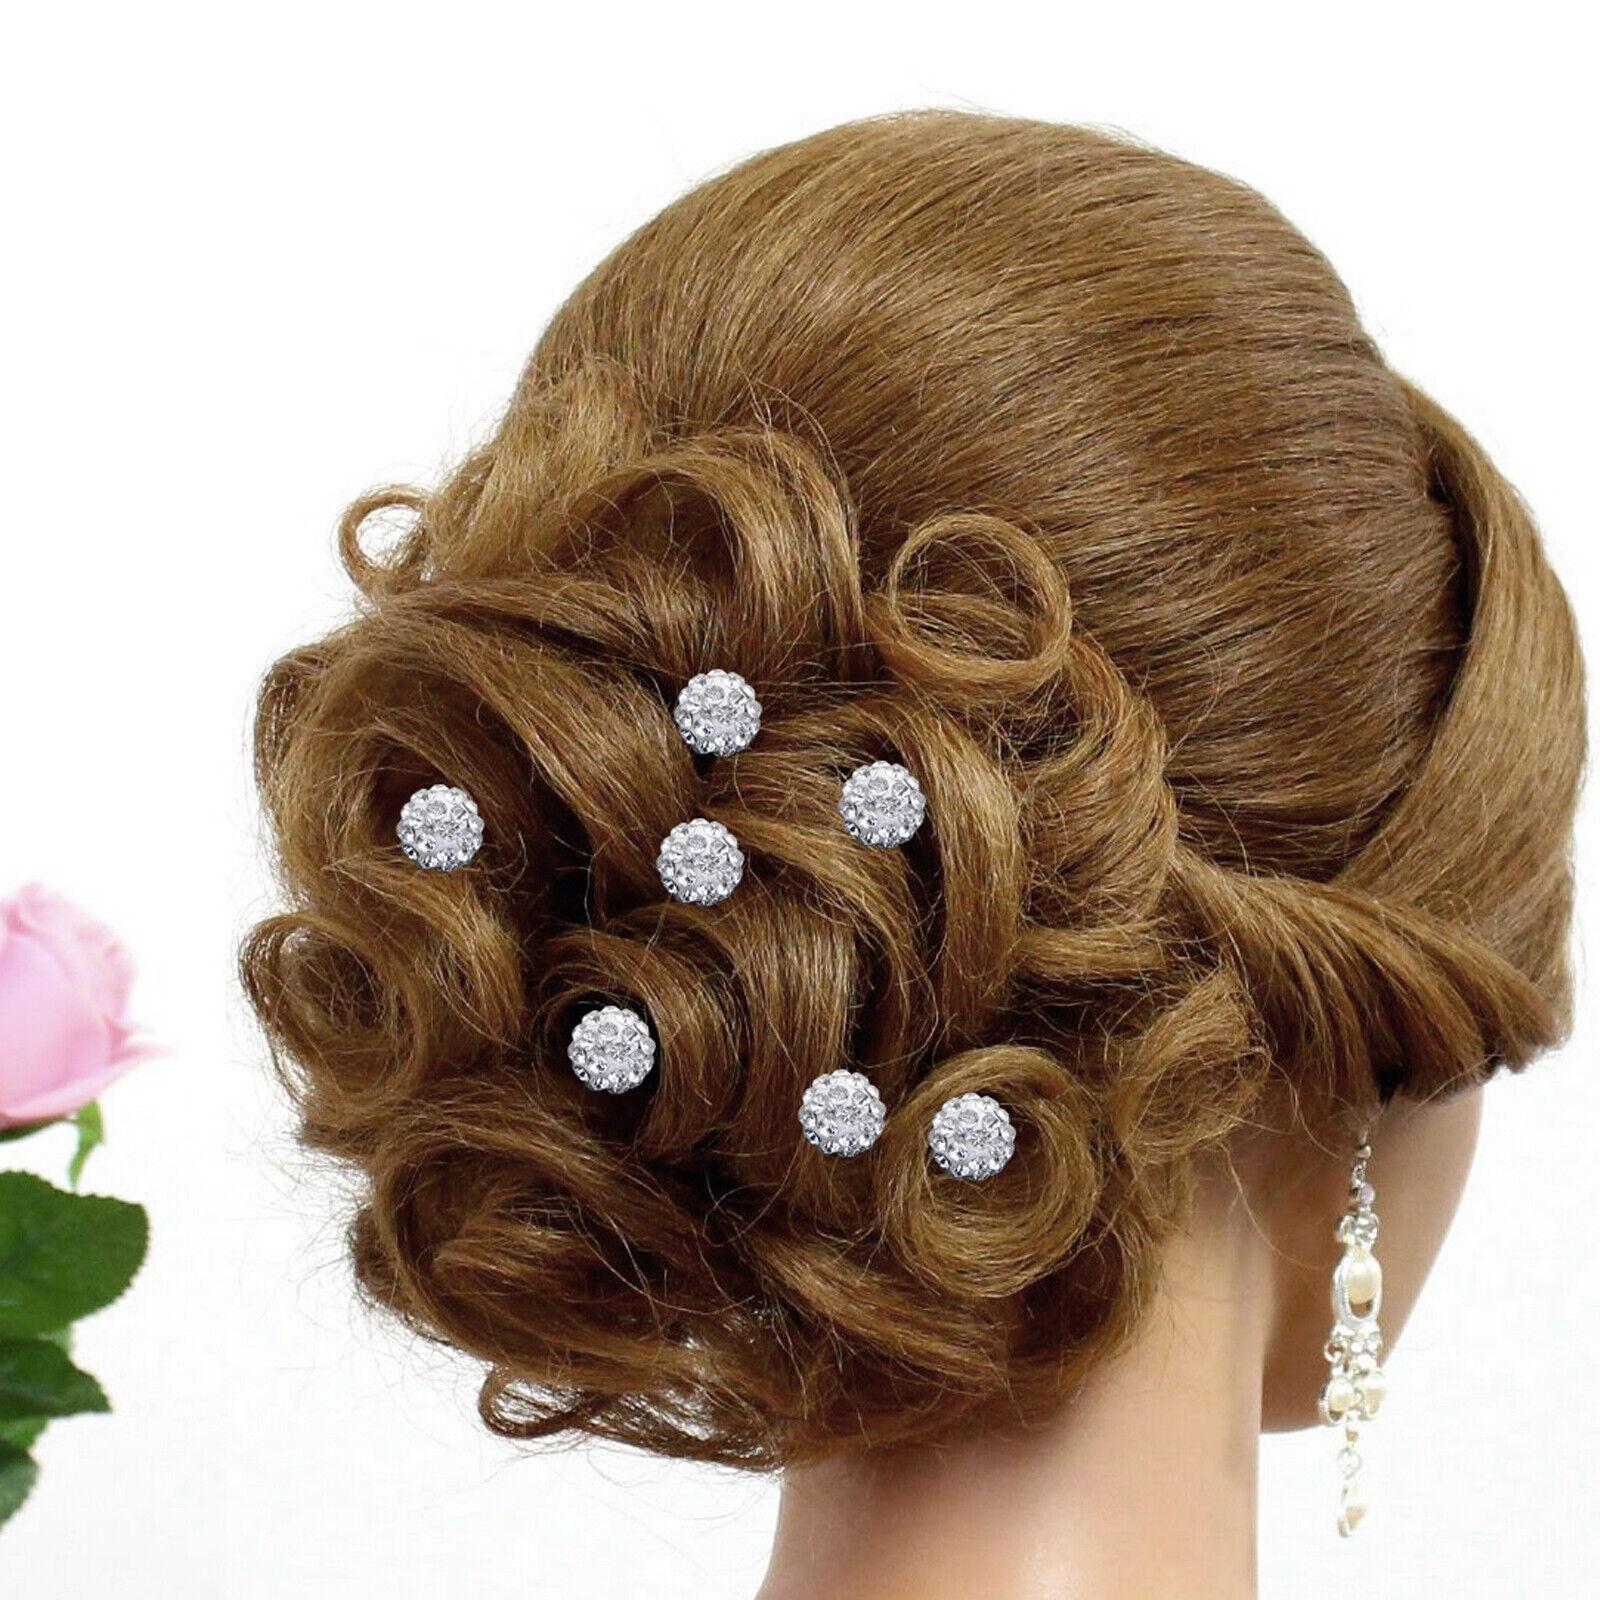 10X Flower Wedding Hair Pins Crystal Diamante Bridesmaid Pearls Bridal Grips UK